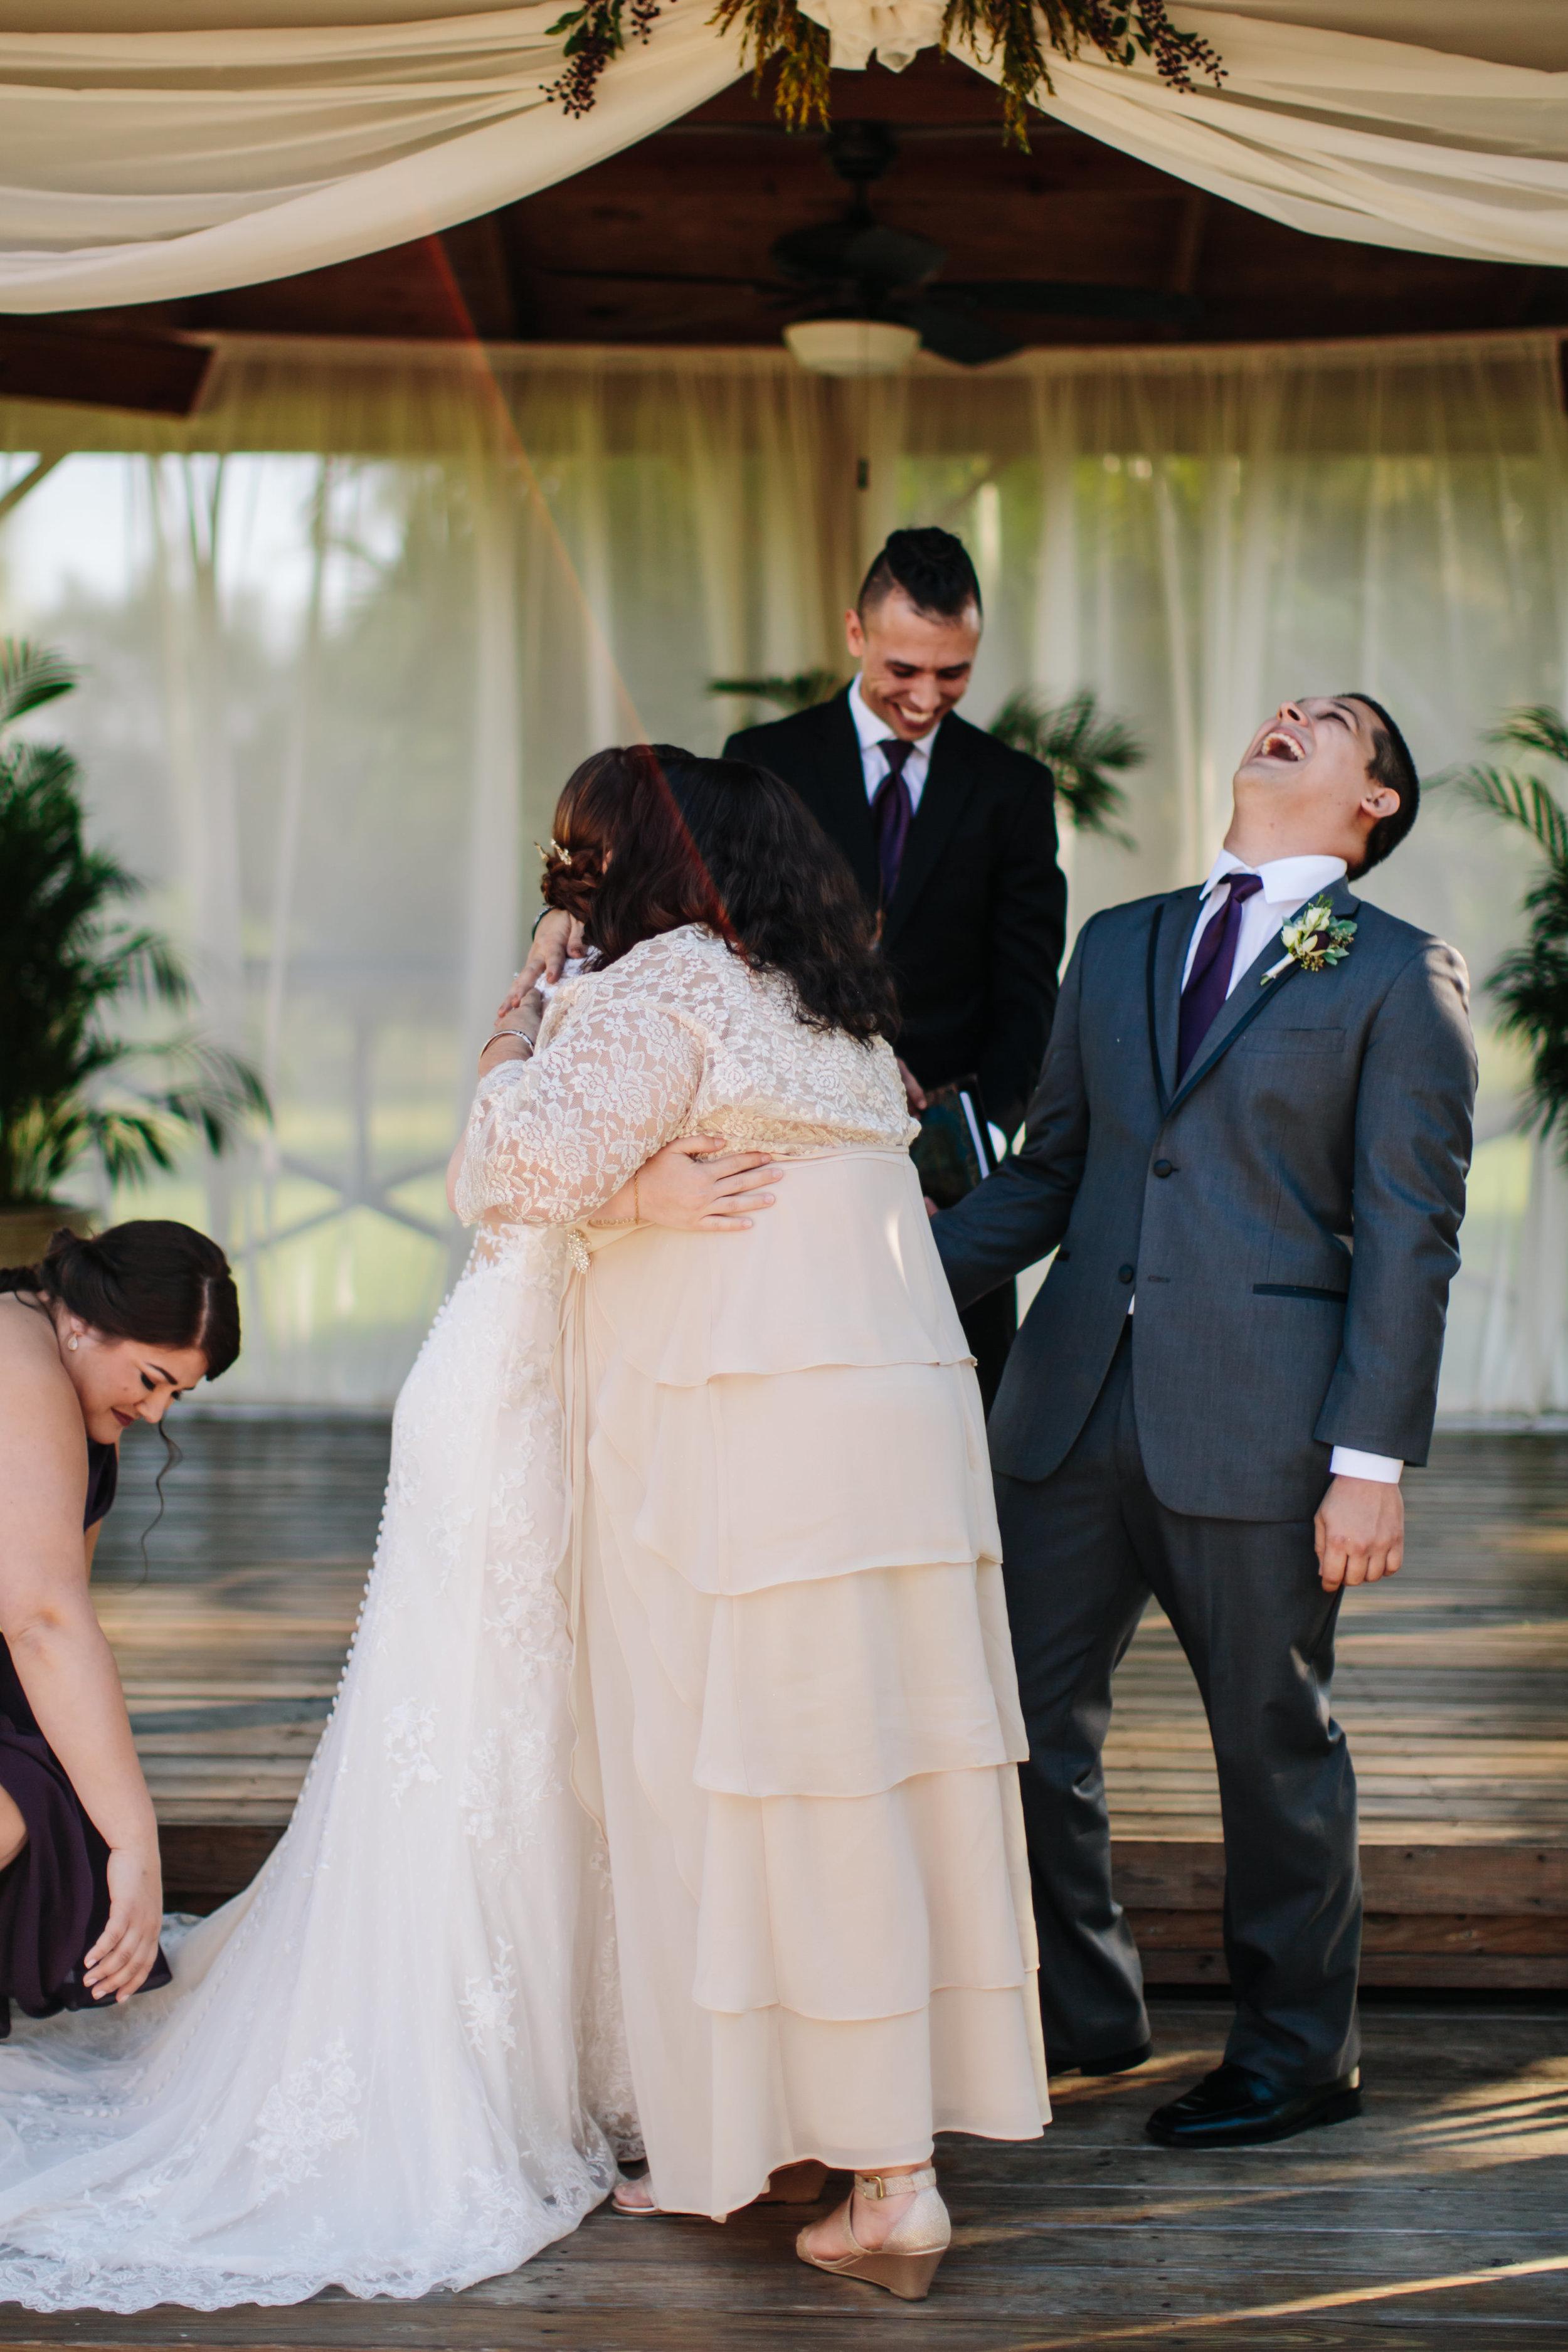 2018.02.17 Whitney and Joe Meyer Melbourne Wedding (255 of 759).jpg